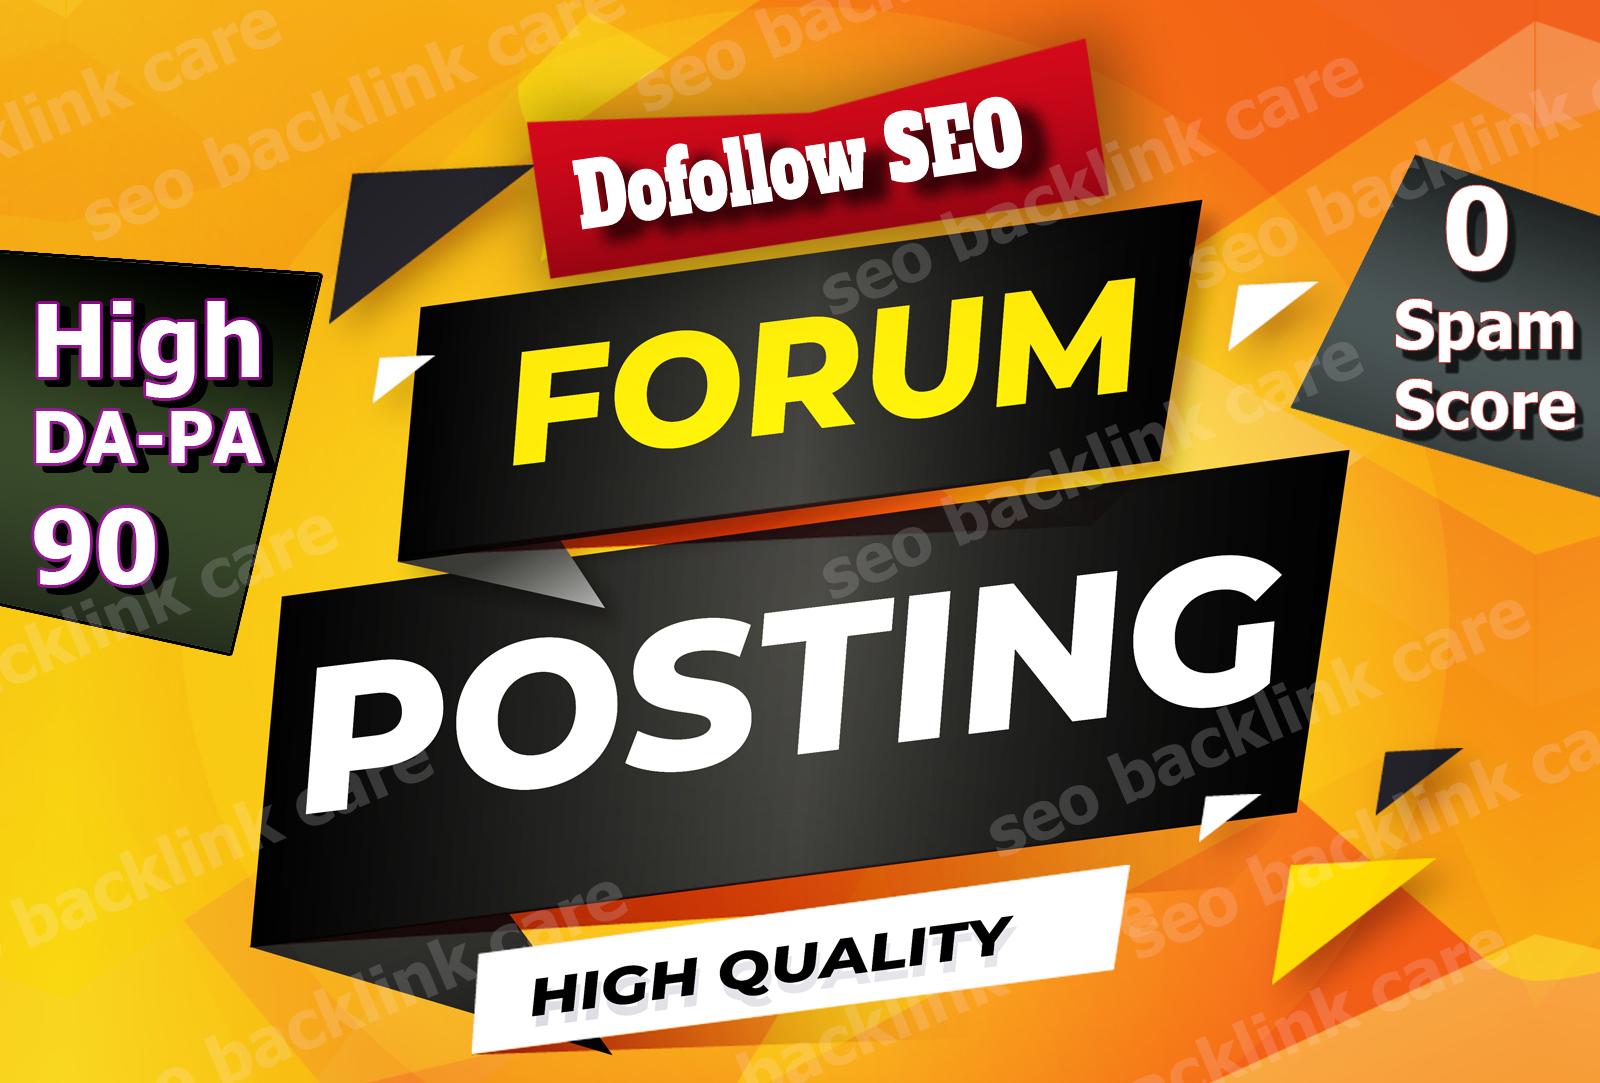 Manually create 20+ Forum posting High da-pa90 0 spam score 0 SS Forum posting backlinks